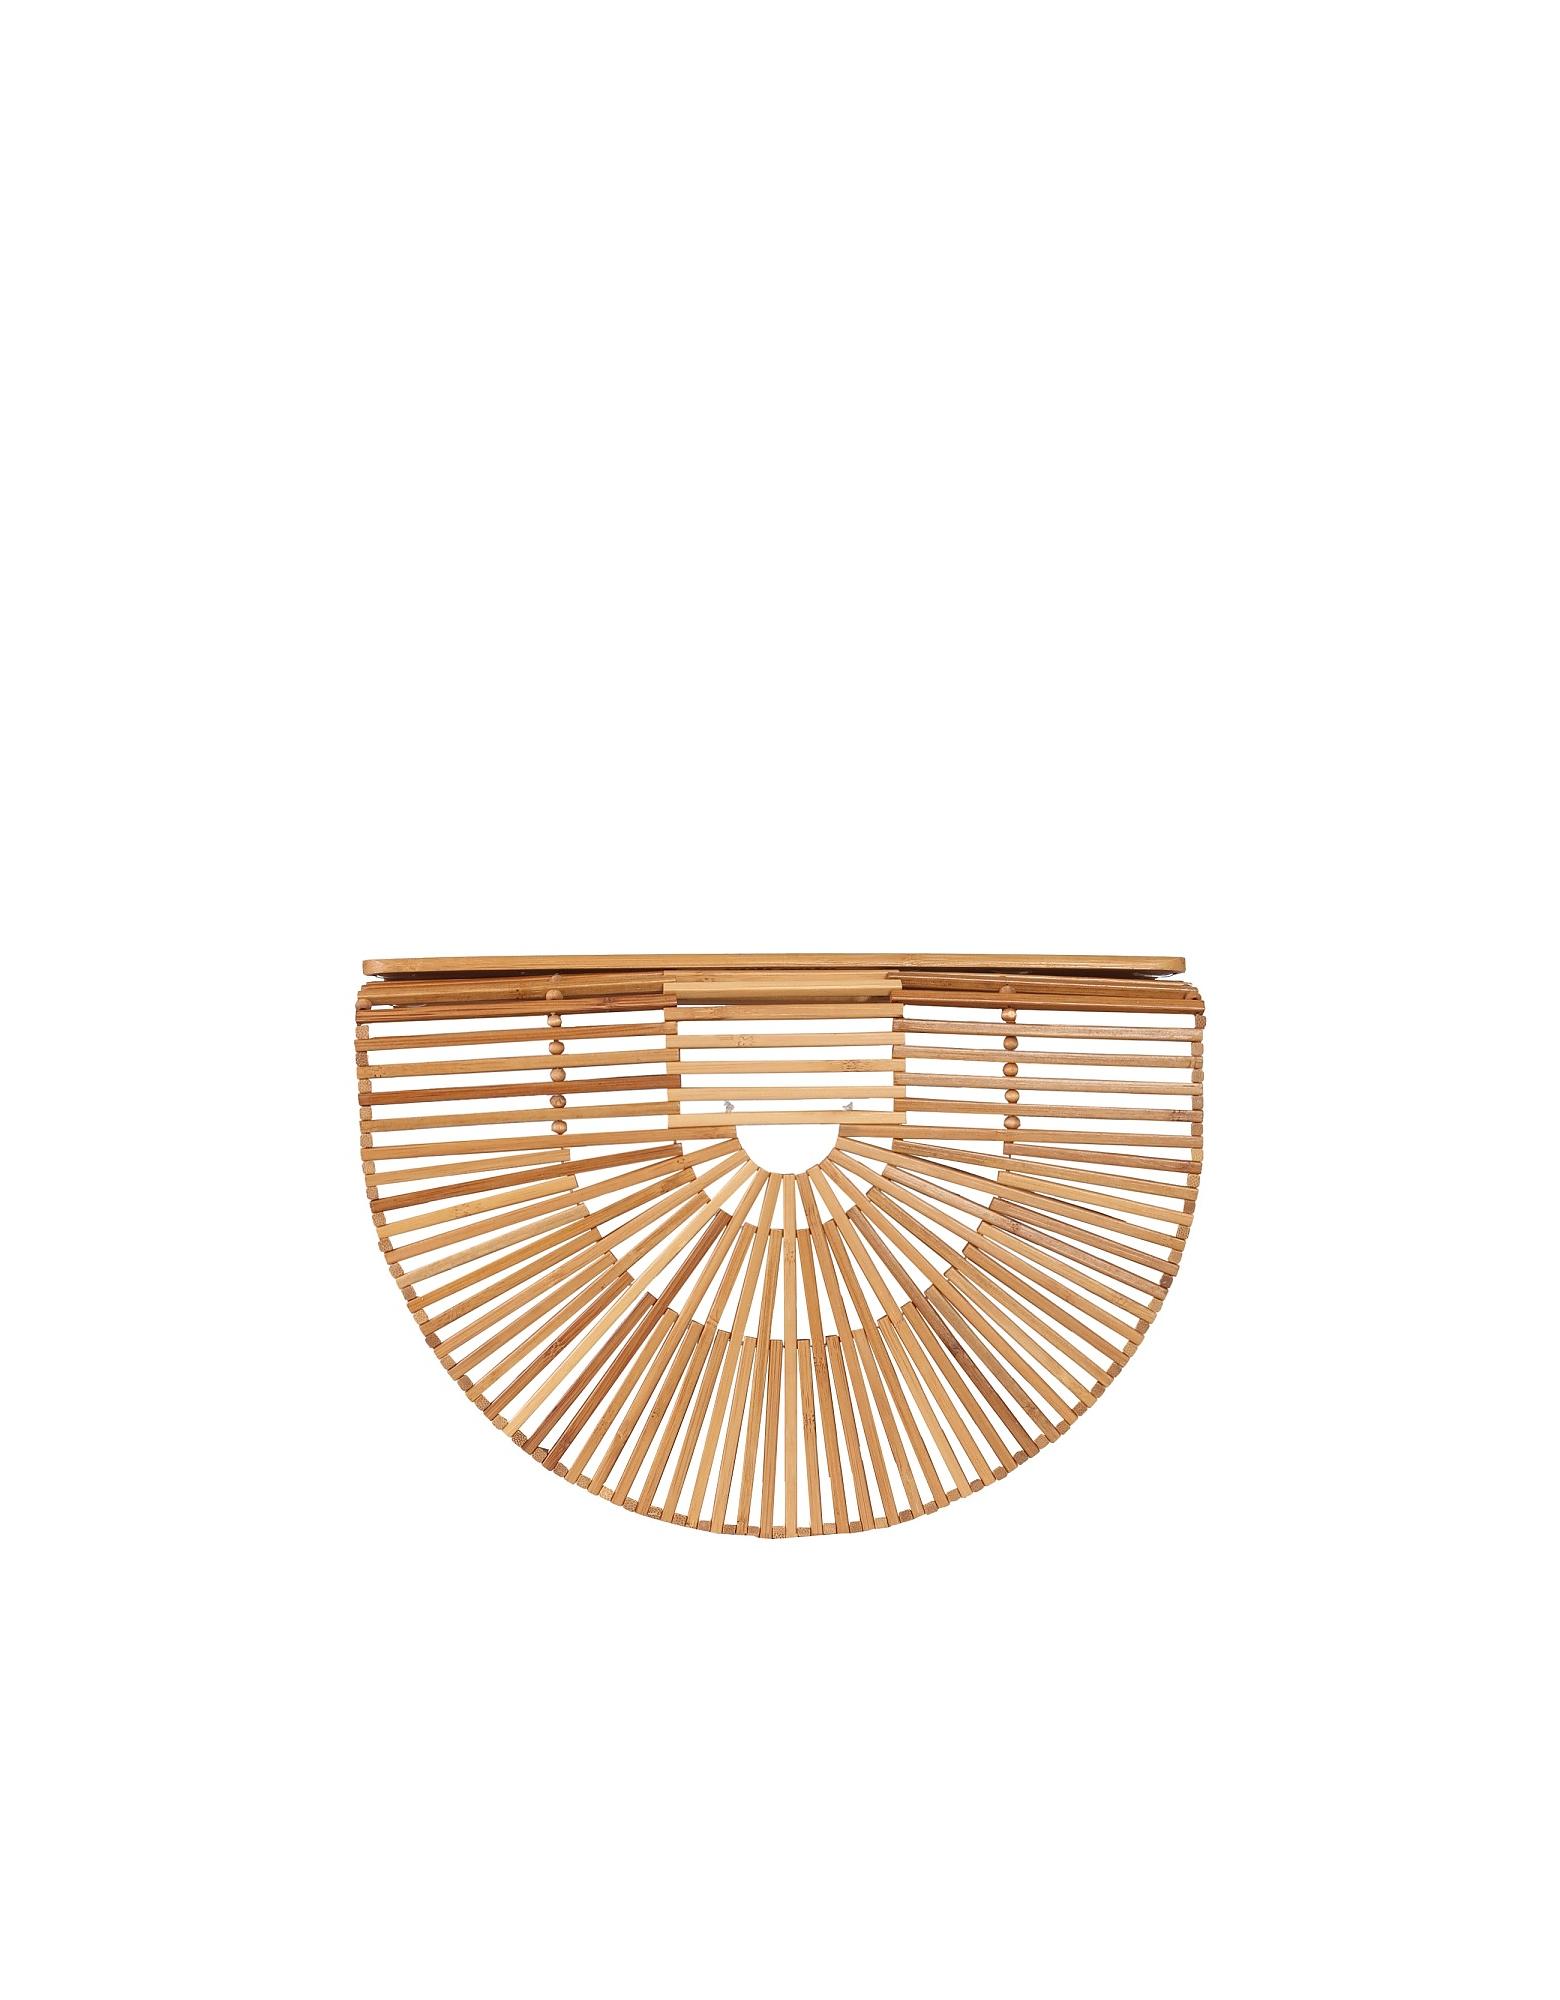 Cult Gaia Designer Handbags, Large Gaia's Ark Bag